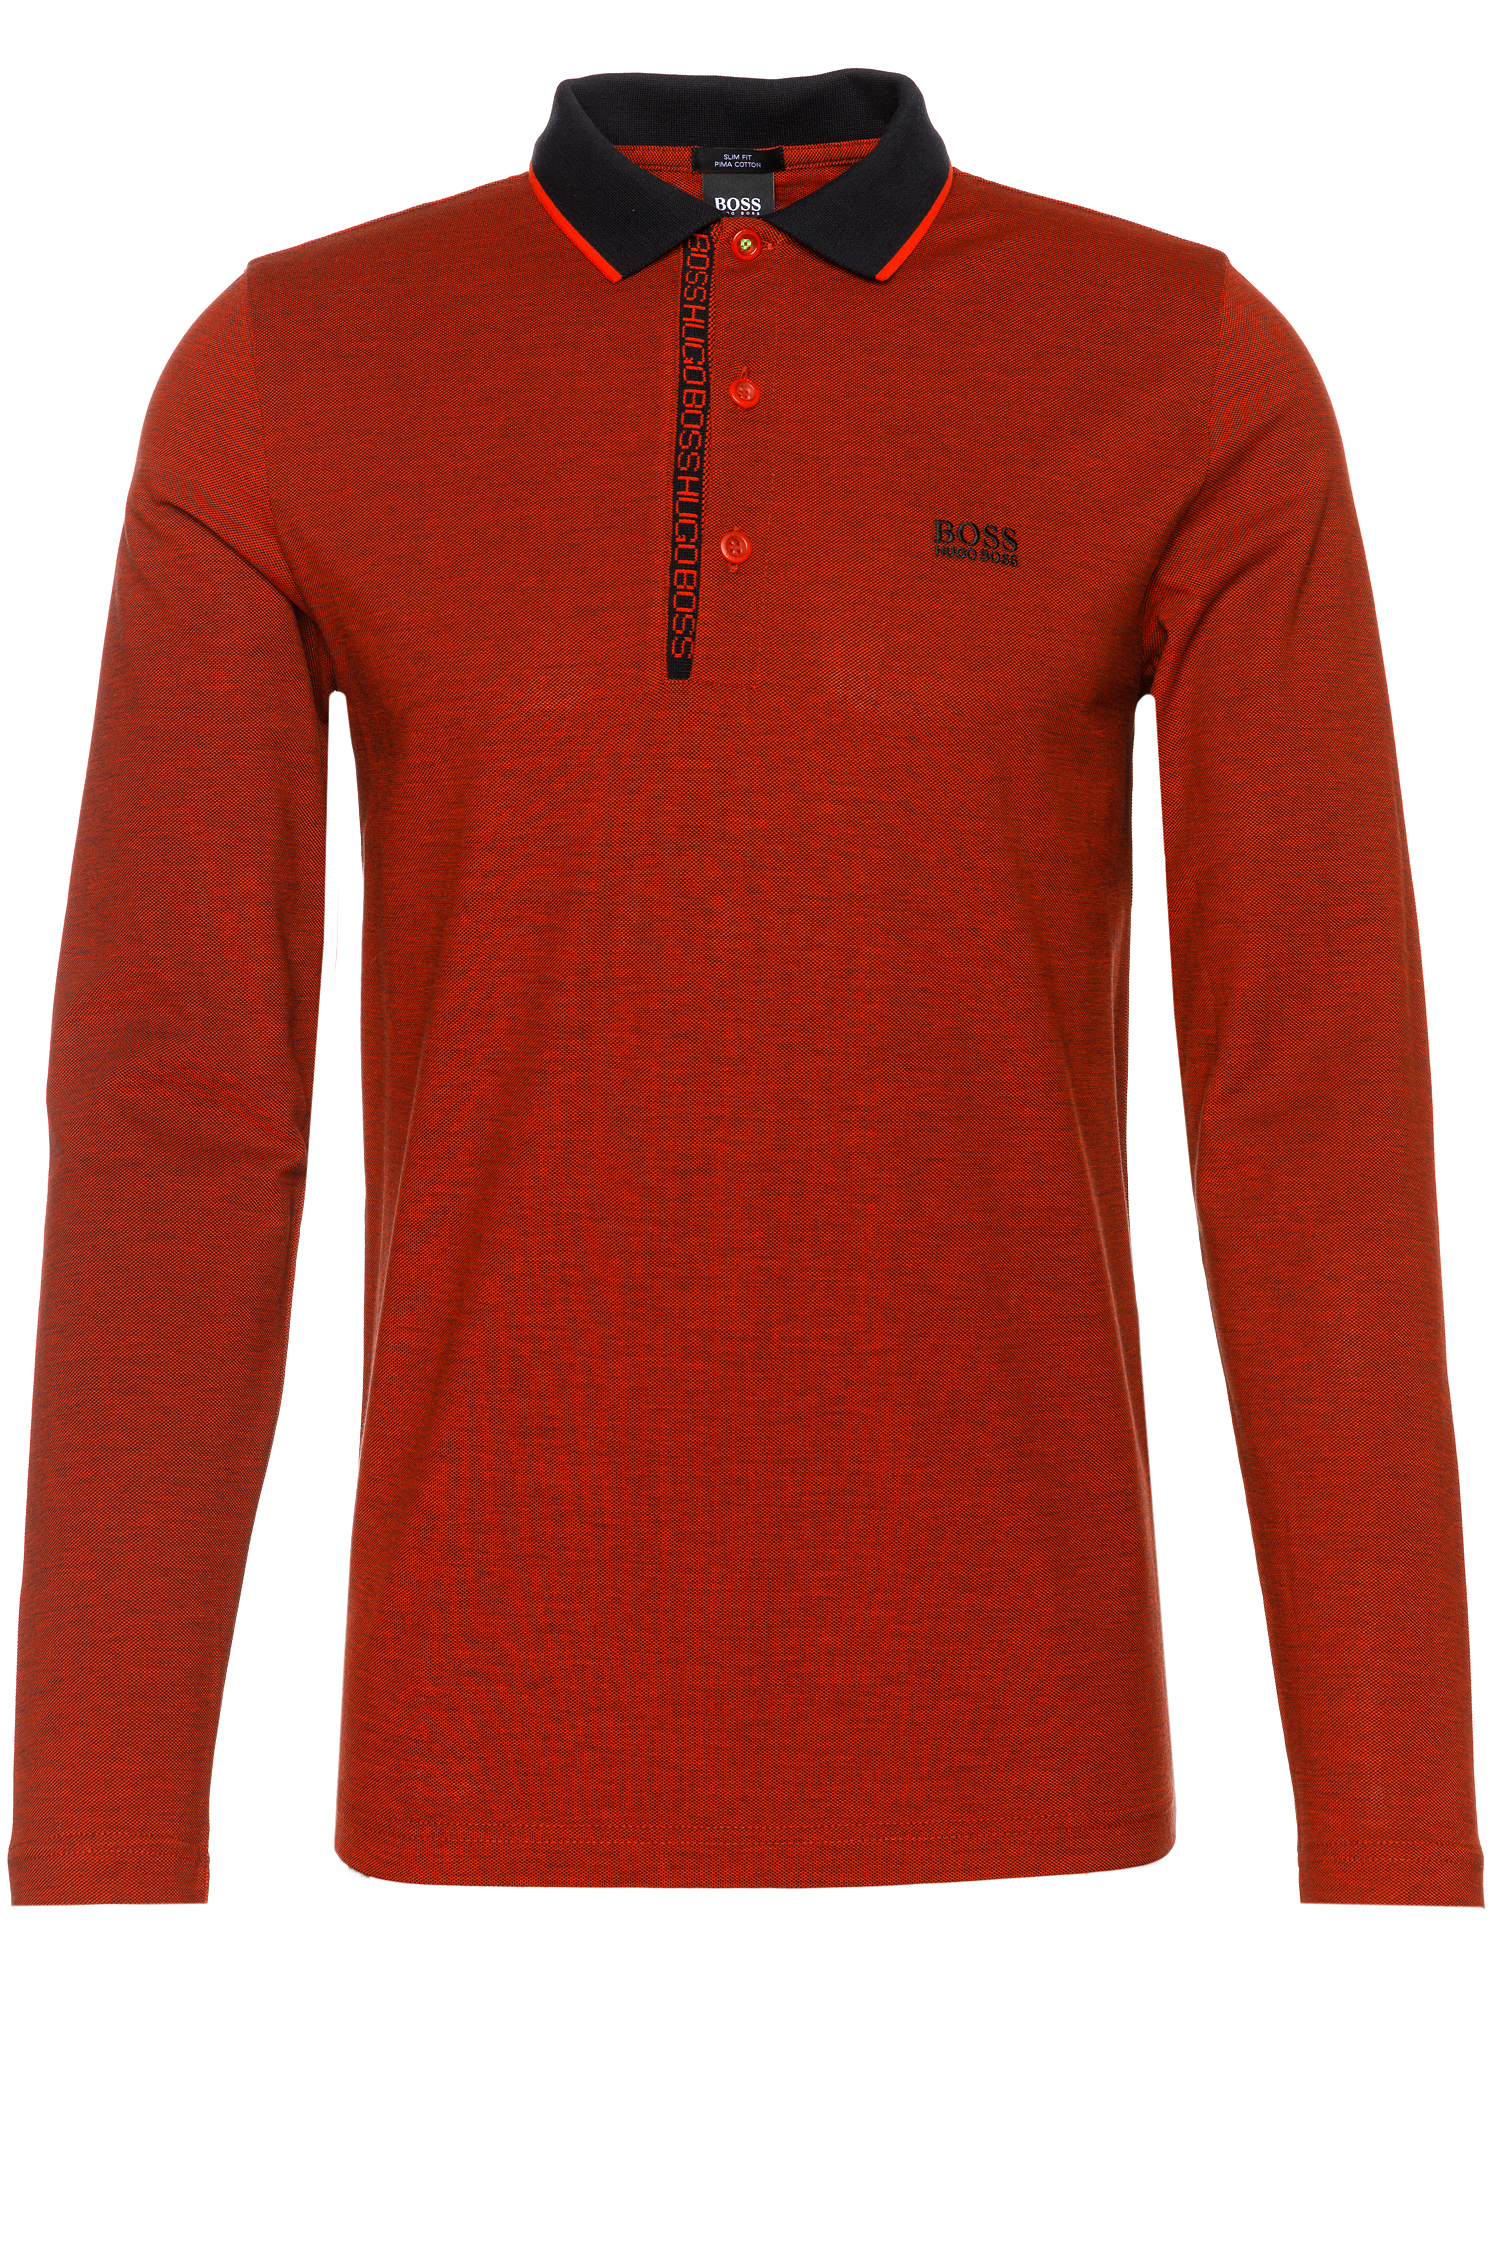 size 40 ccc1b 9ca60 Langarm-Poloshirt Pleesy 4